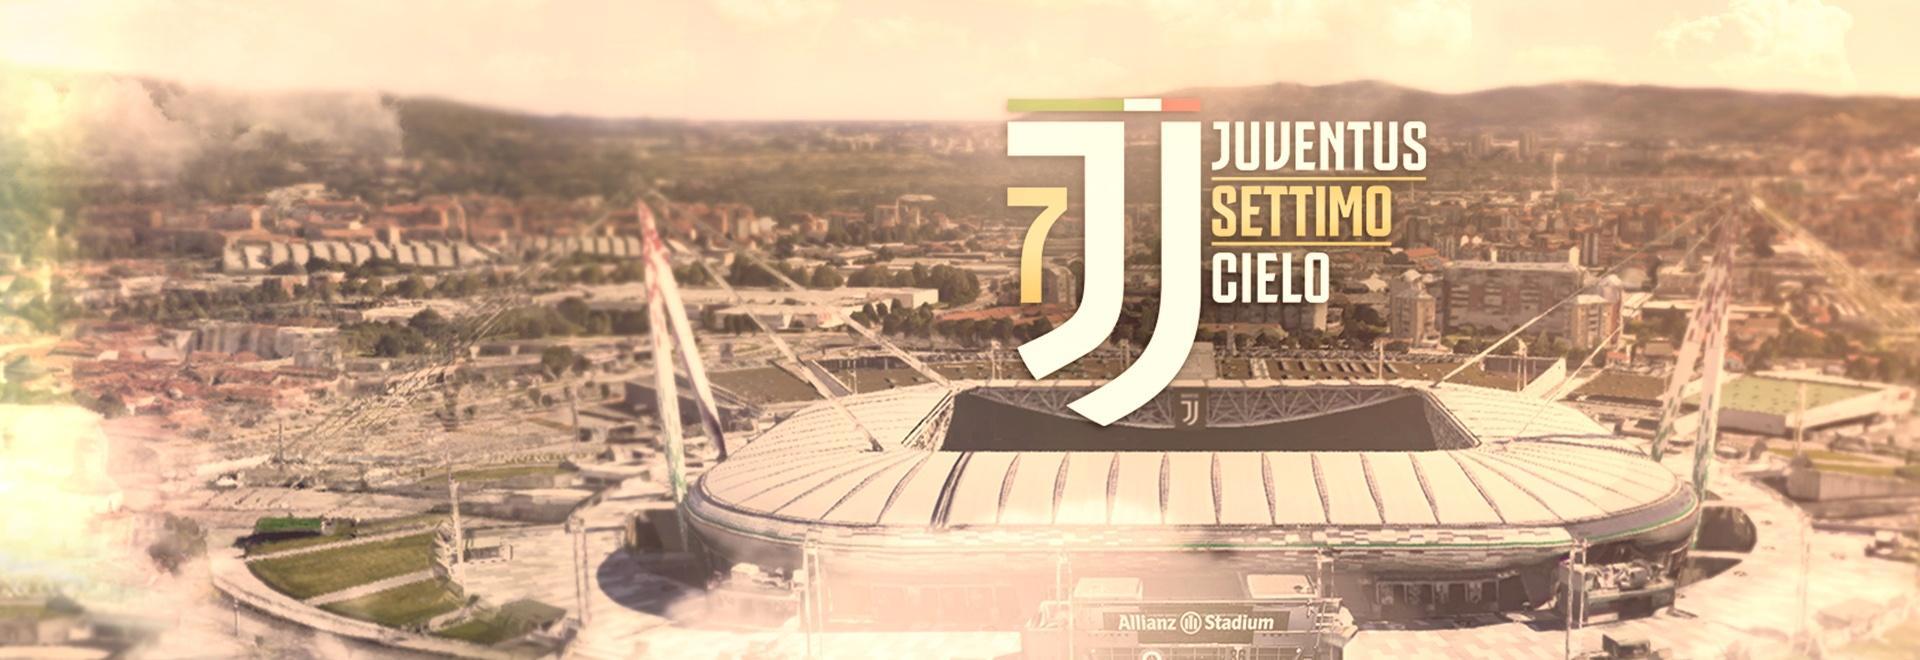 Juventus Settimo Cielo